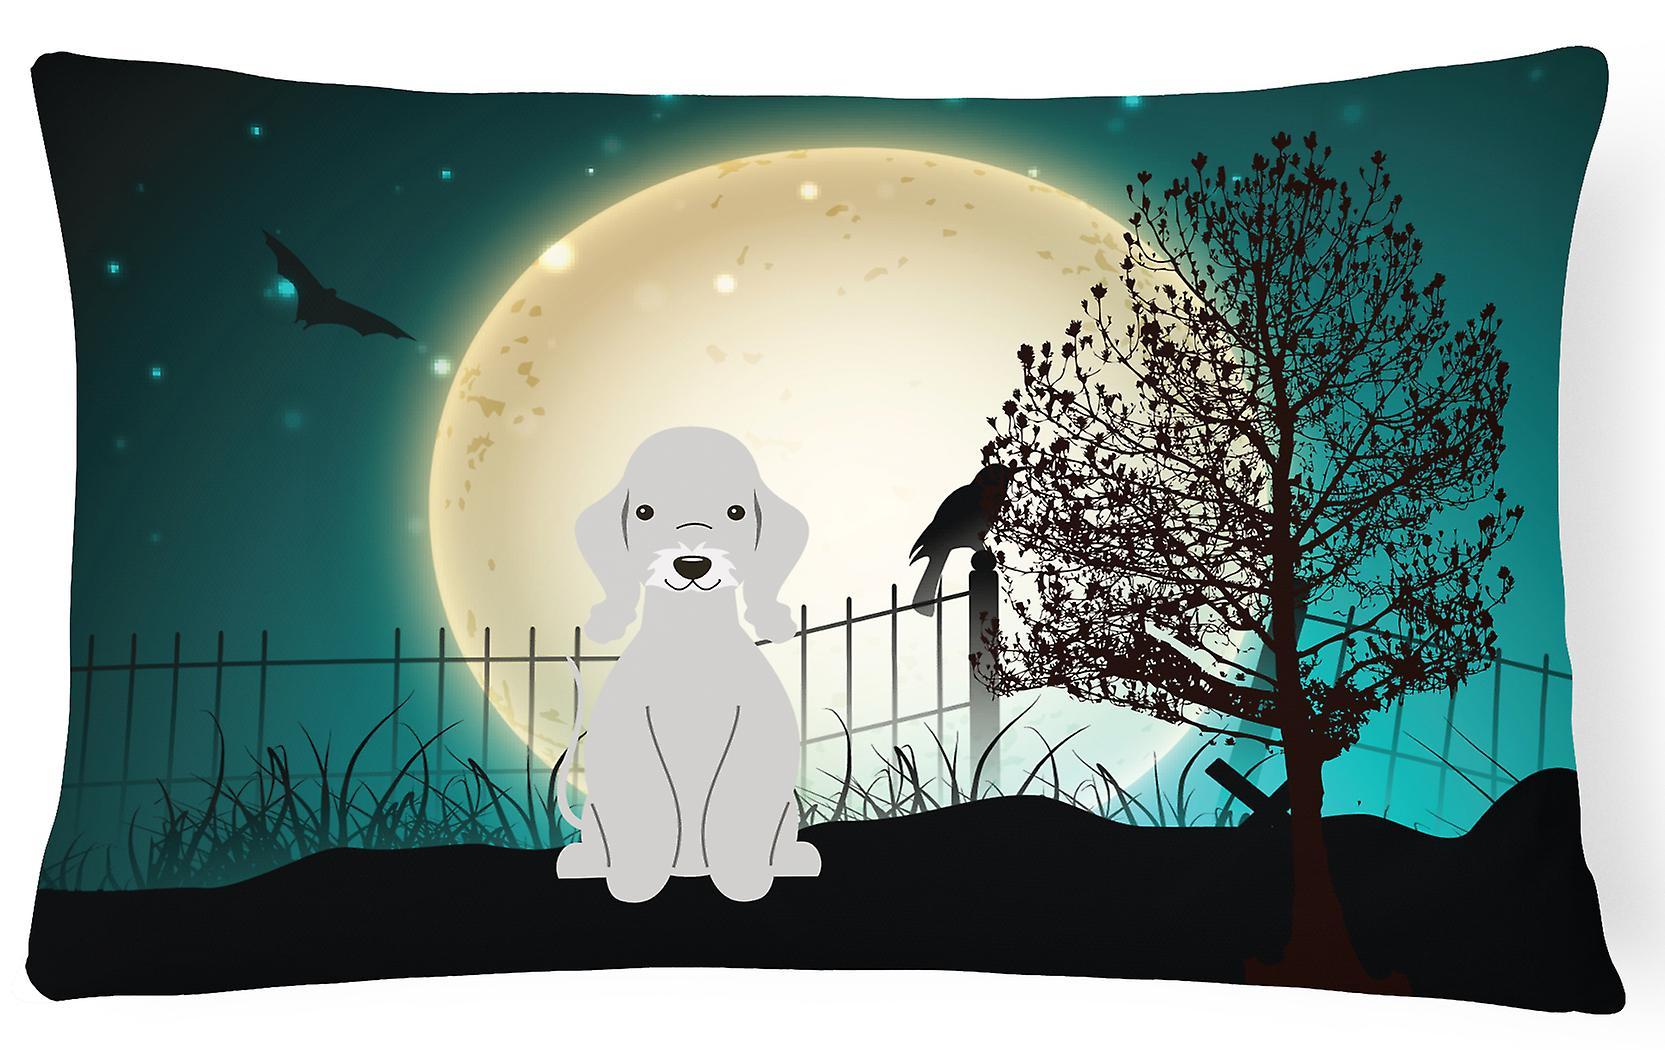 Toile Bleu Bedlington Terrier Décoratif Oreiller Effrayant Tissu Halloween NwOZnk8X0P